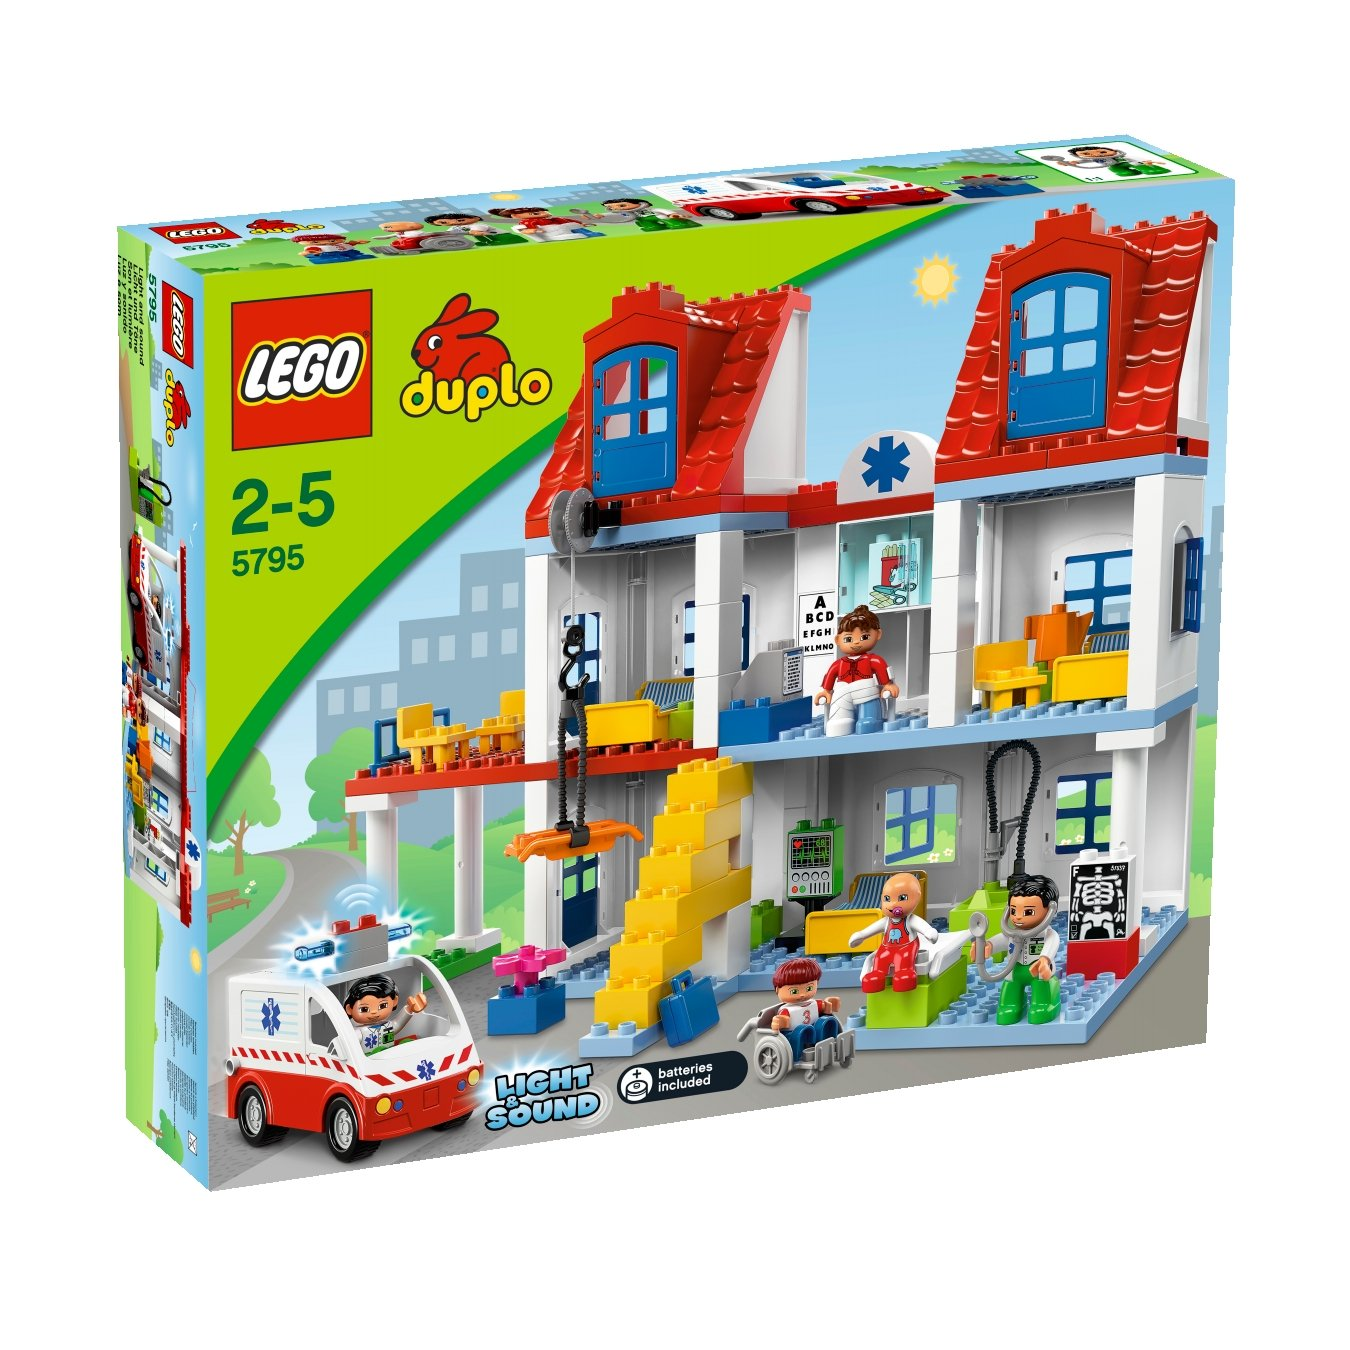 LEGO LEGO LEGO Duplo 5795 - Großes Stadtkrankenhaus b55d12